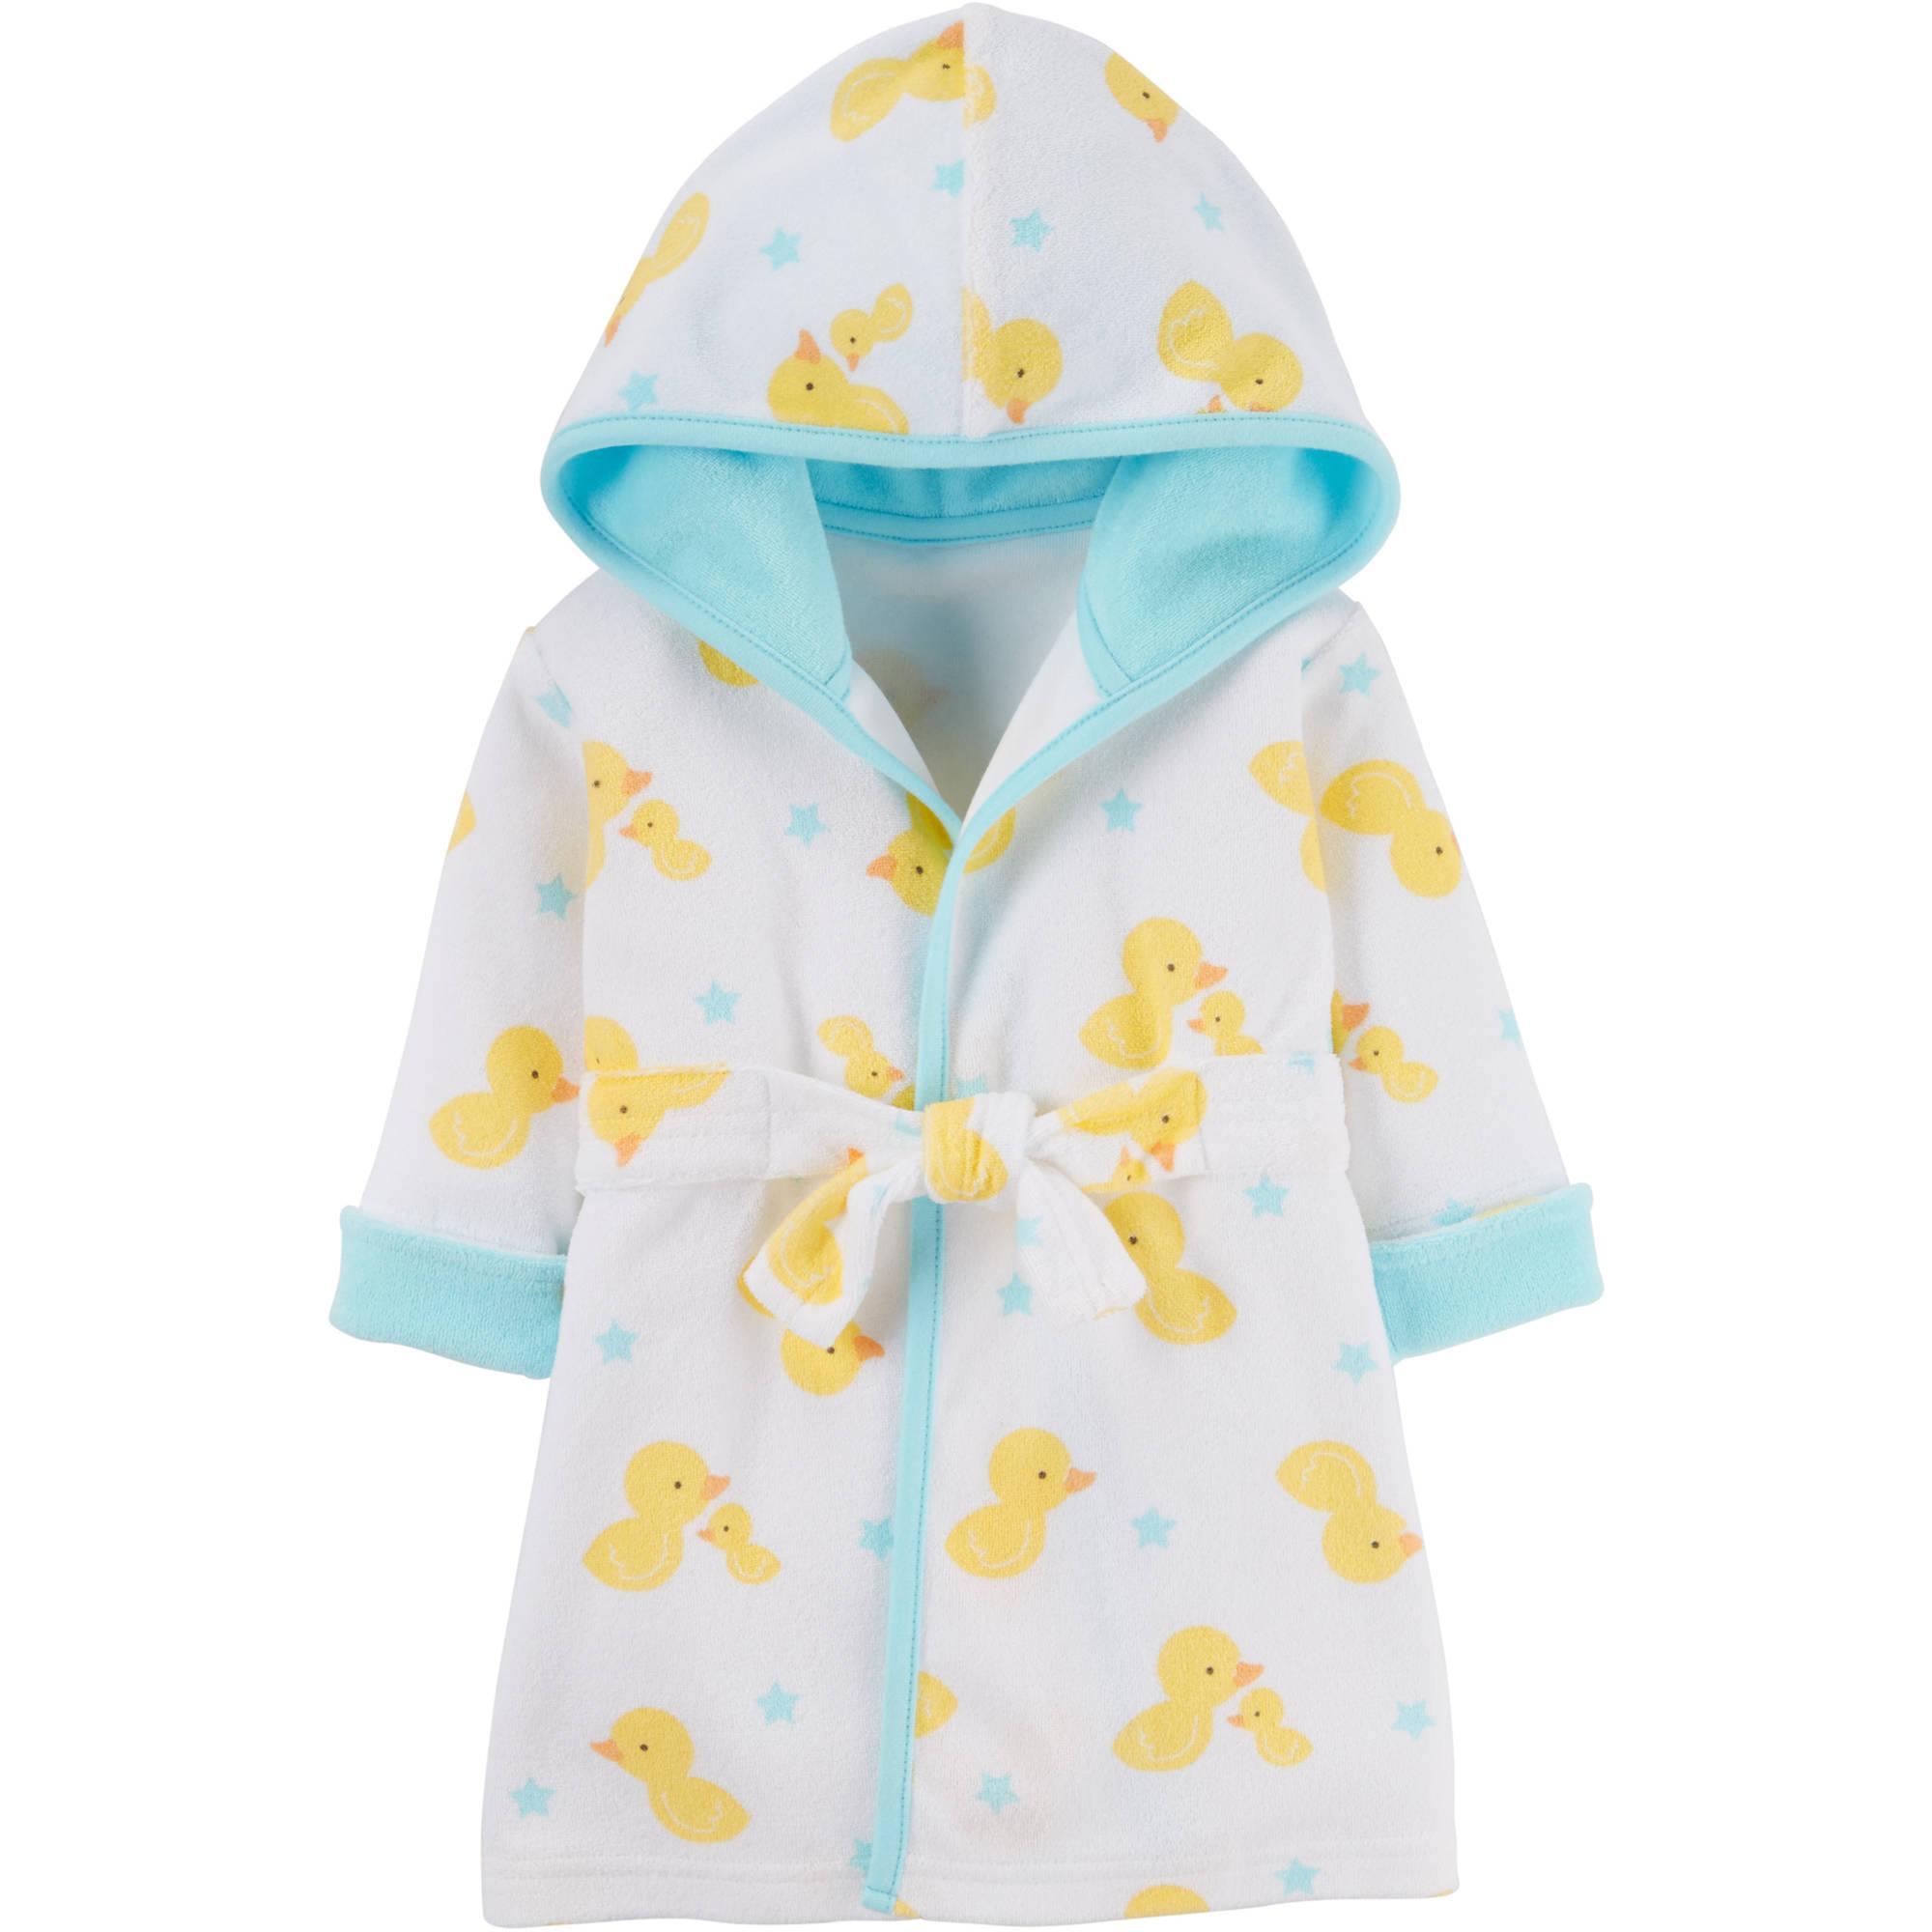 Child Of Mine by Carter's Newborn Baby Boy or Girl Unisex Robe